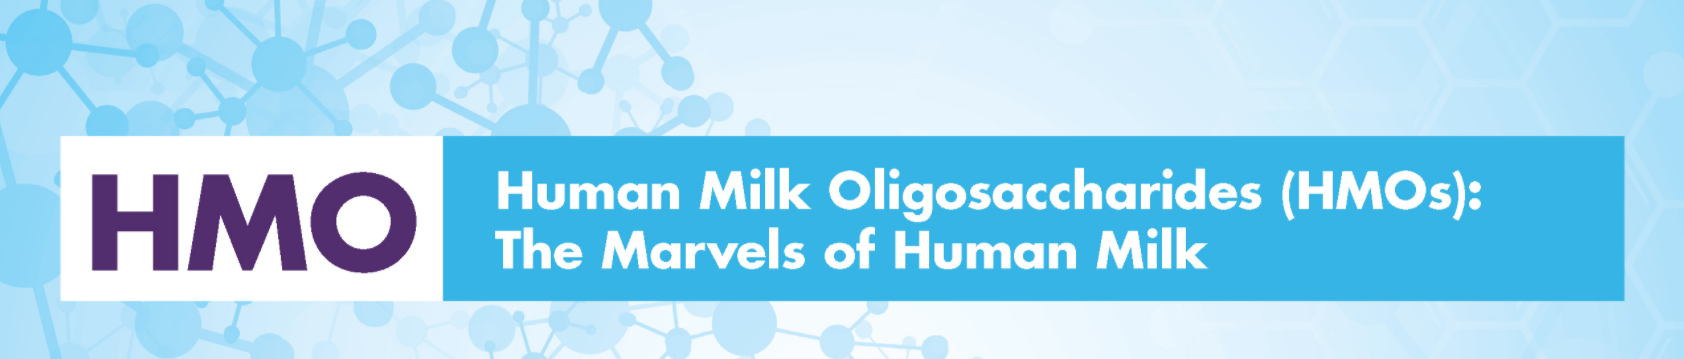 HMO Marvel webinar registration banner